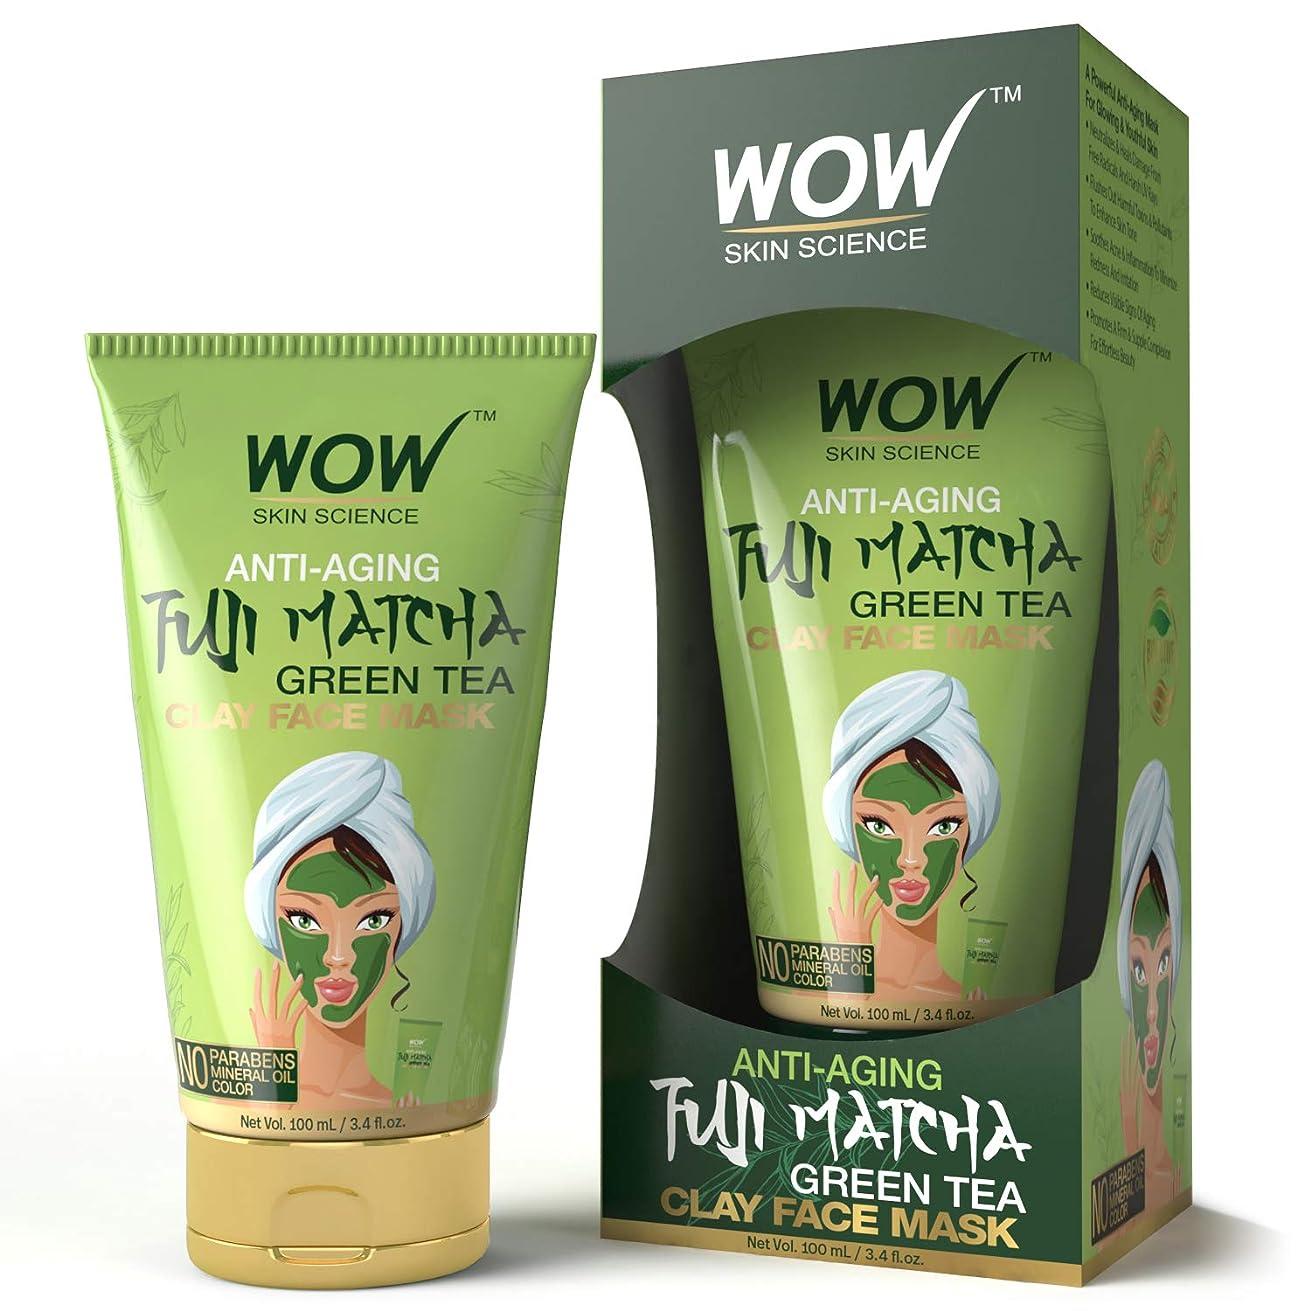 WOW Skin Science Anti-Aging Fuji Matcha Green Tea Clay Face Mask - 100 mL tube